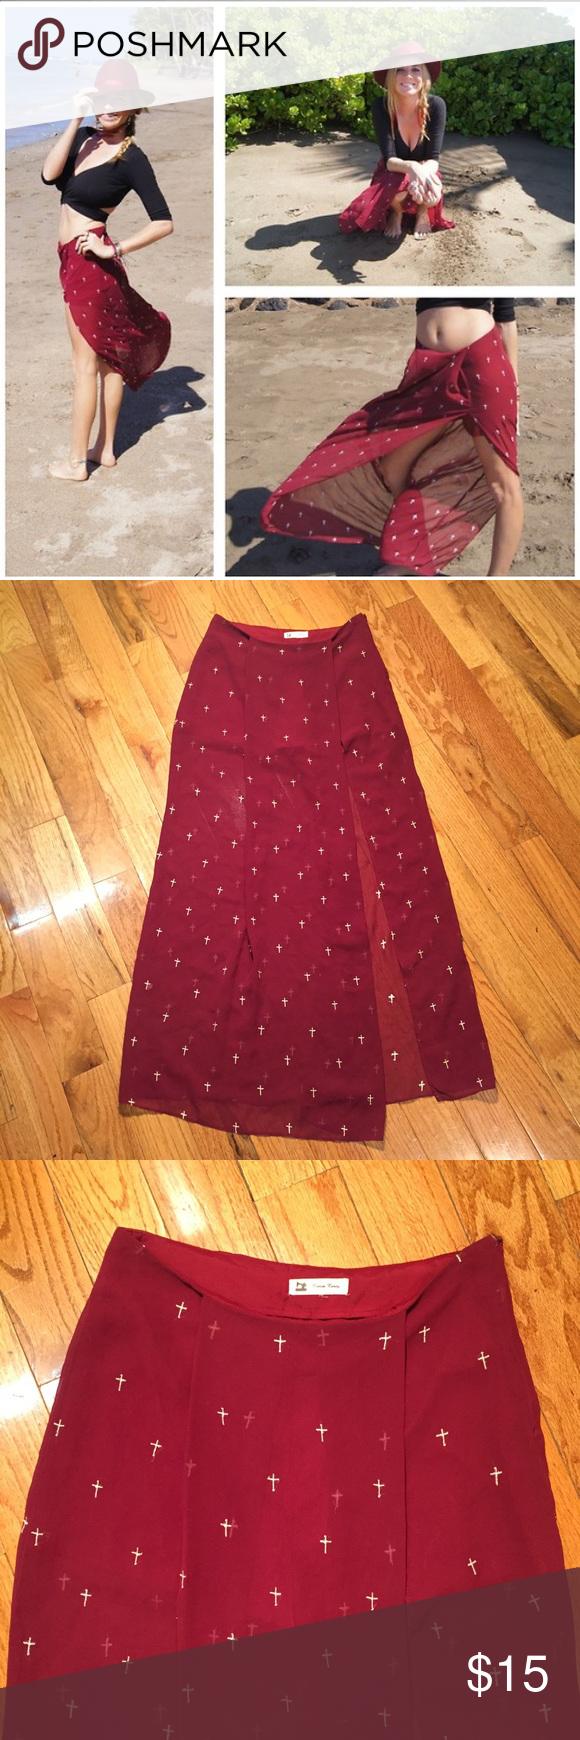 Cotton candy maxi gauze skirt crosses burgundy m sheer maxi skirt